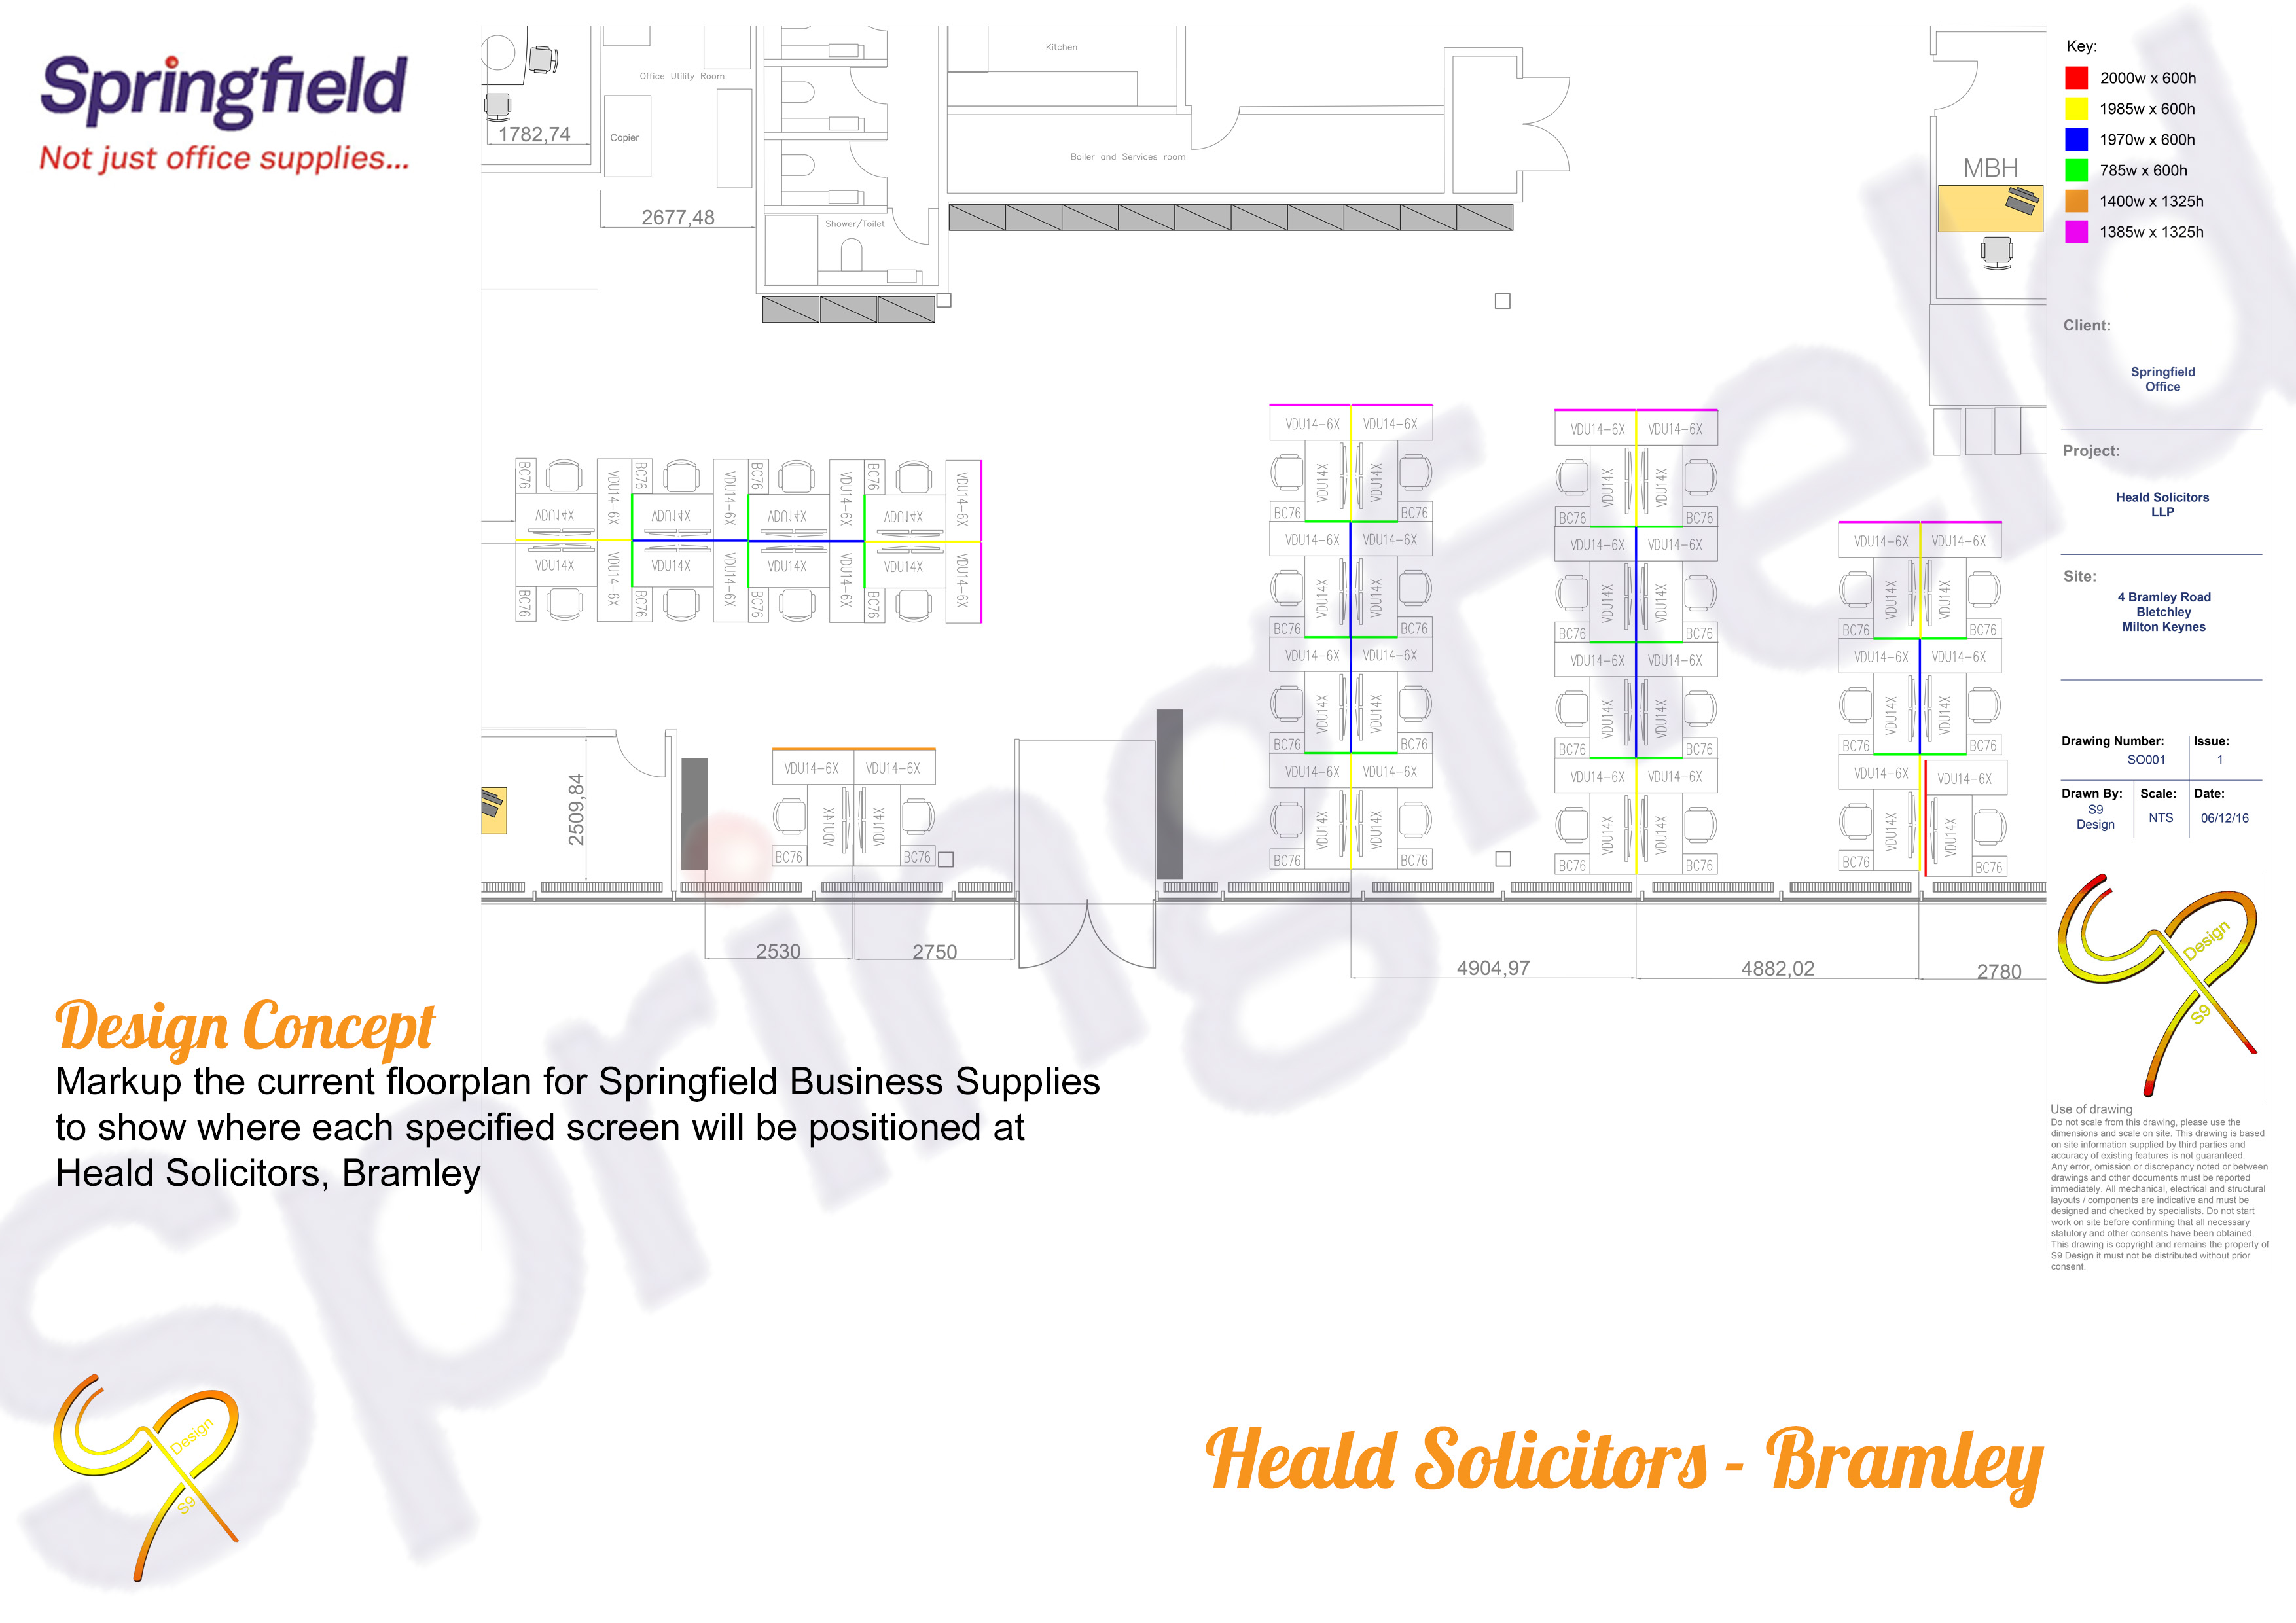 Springfield Business Supplies - Heald Solicitors, Bramley